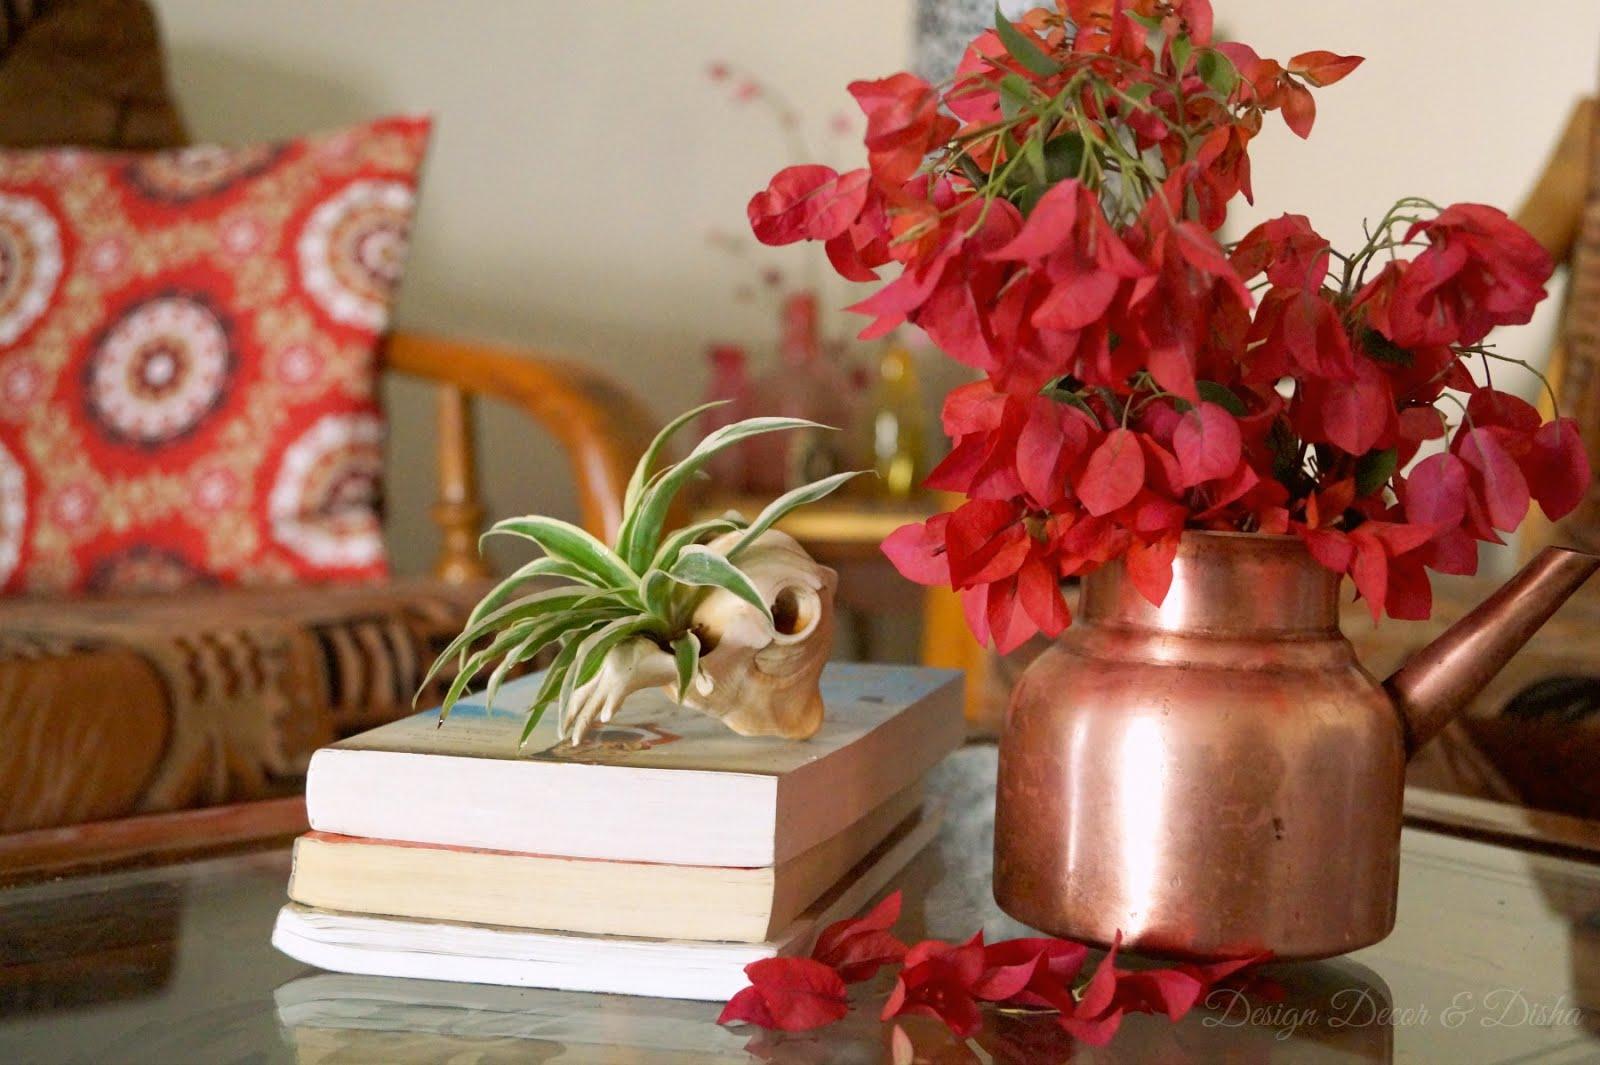 Design decor disha an indian design decor blog for Decor vs decoration